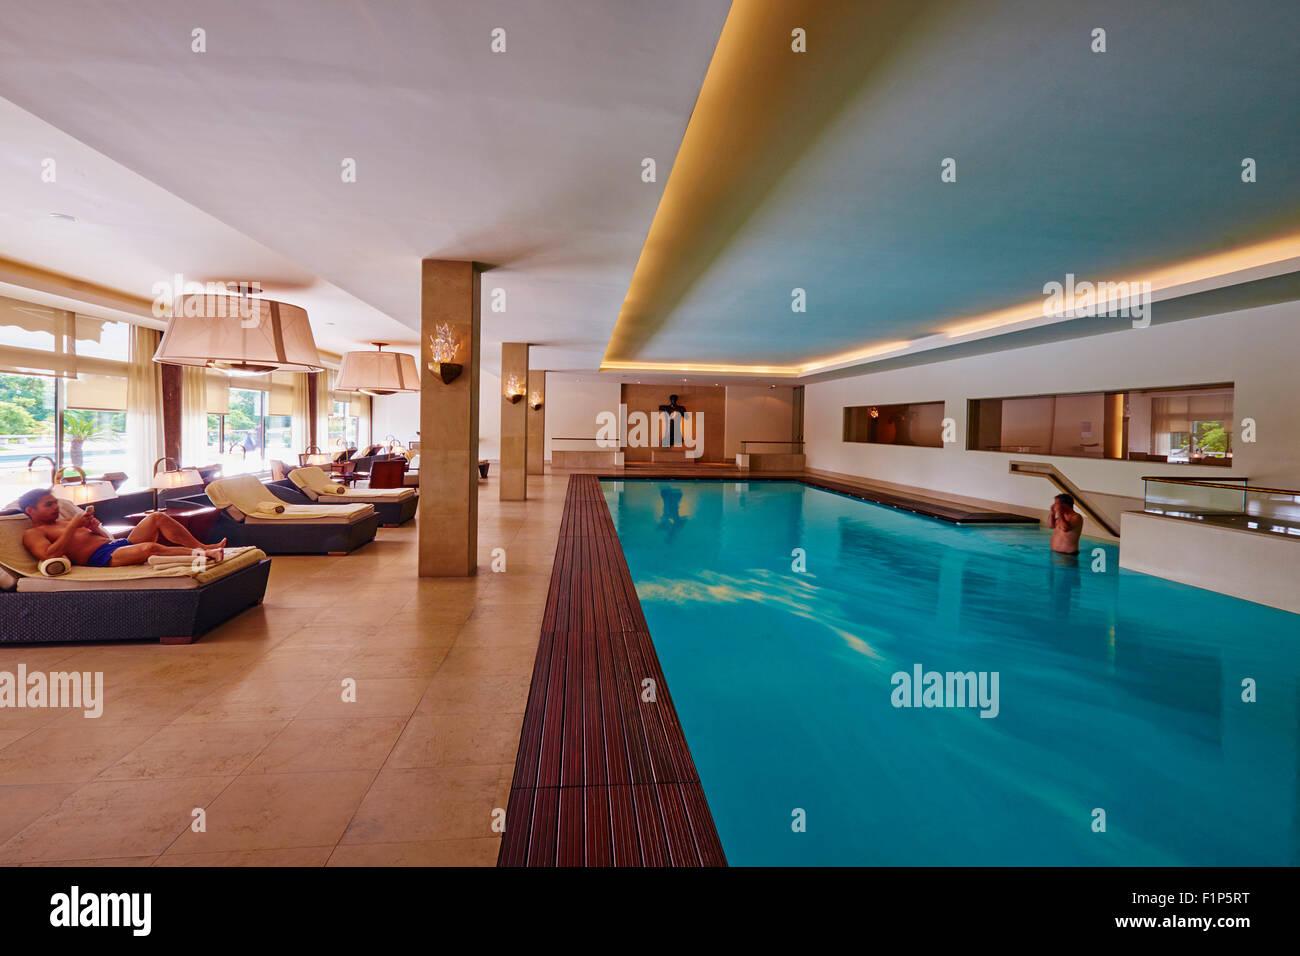 Portugal, Lisbon, Ritz Four Seasons hotel - Stock Image